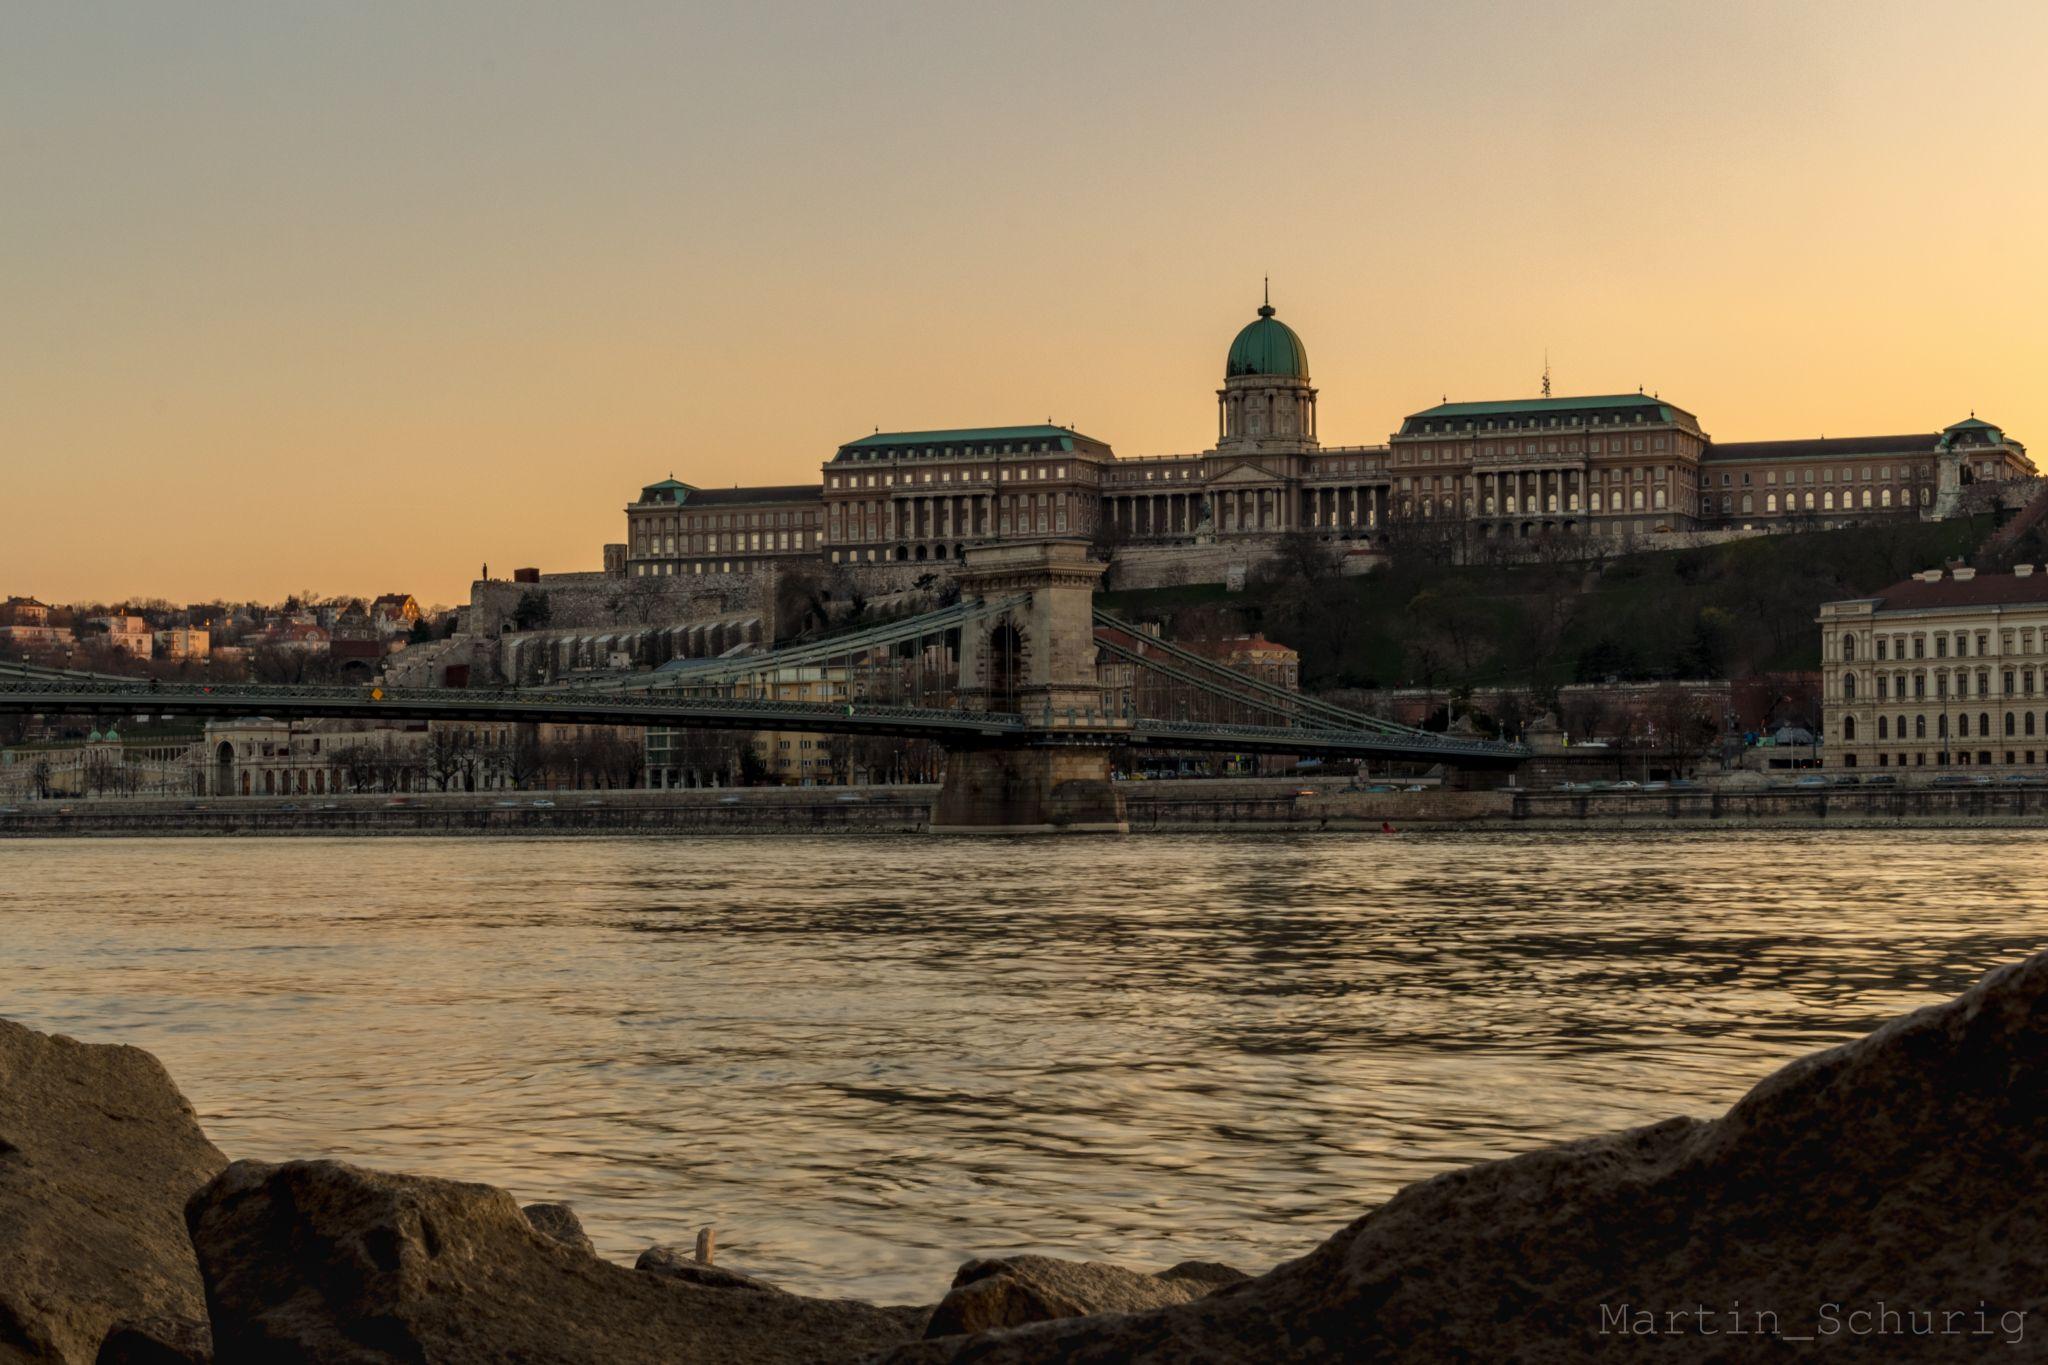 Buda Castle and Chain Bridge, Hungary